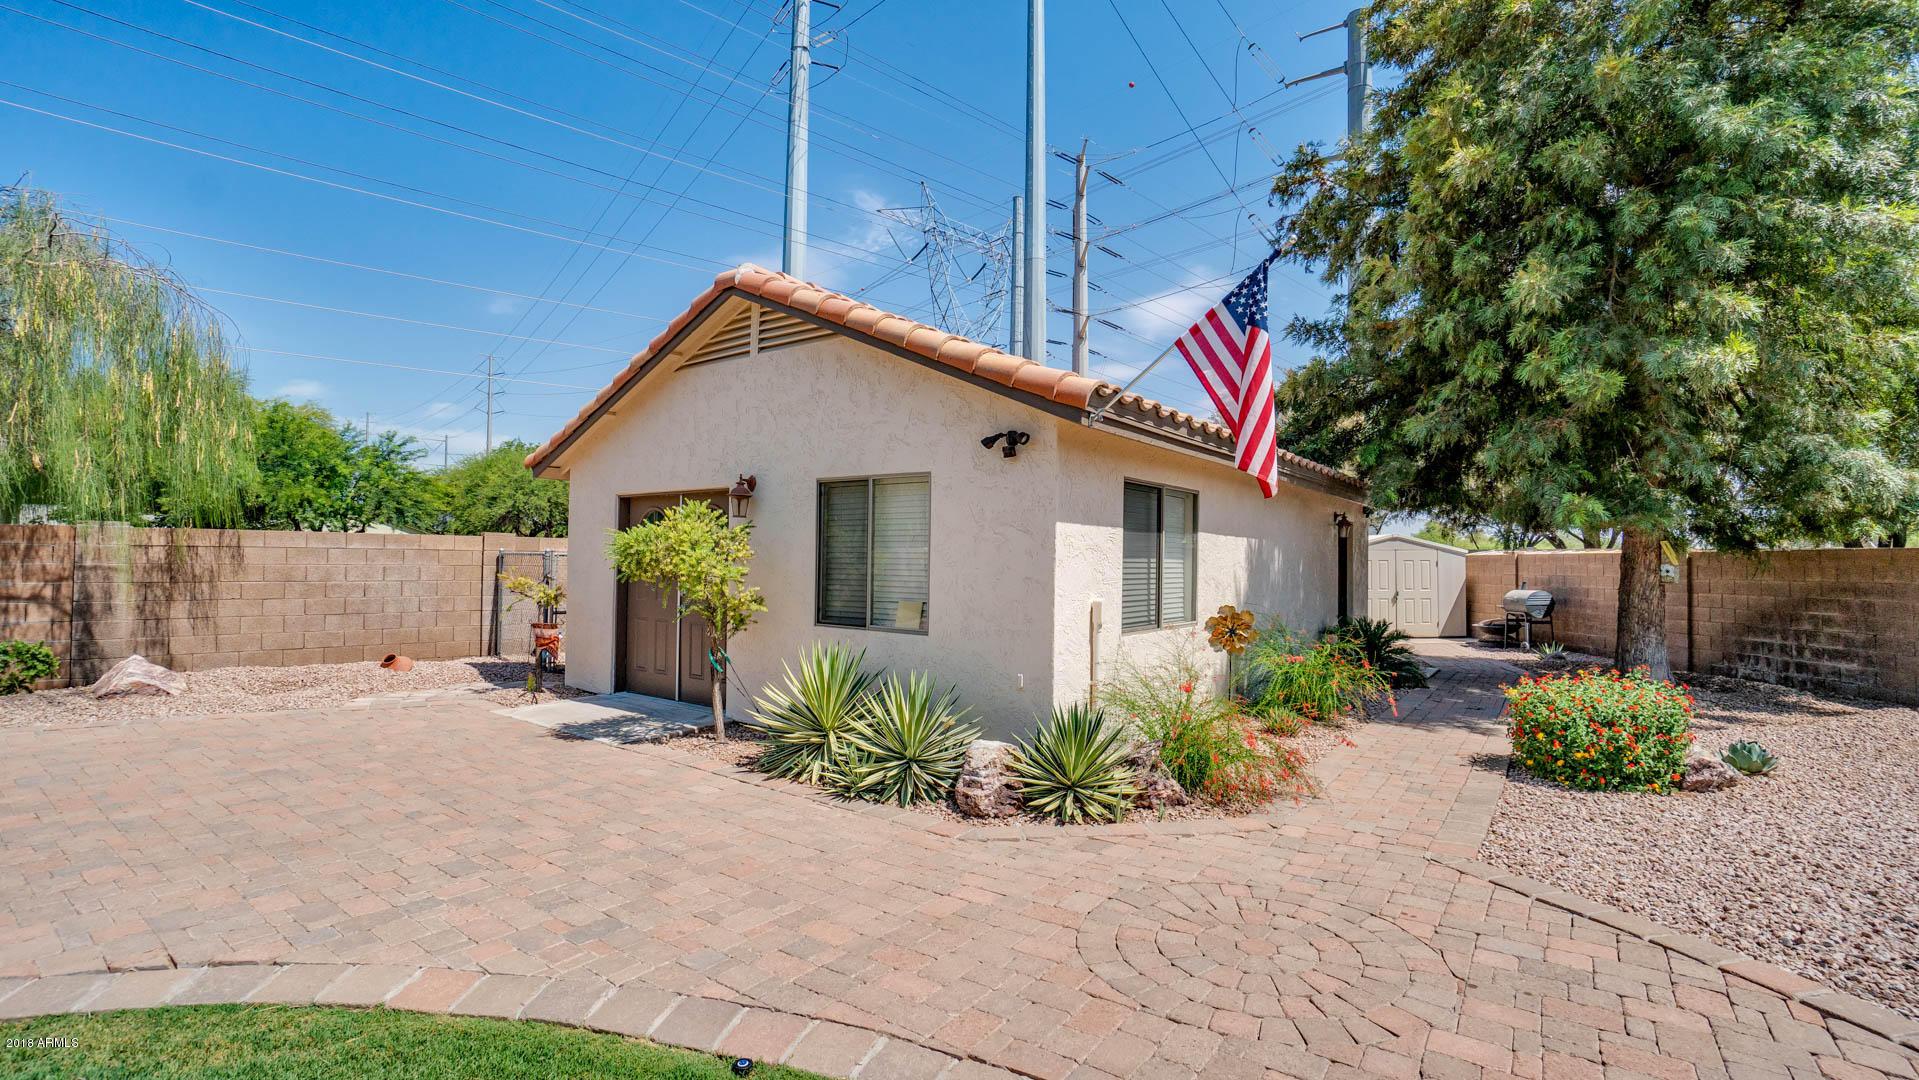 MLS 5780025 405 N SULLEY Drive, Gilbert, AZ 85234 Gilbert AZ Three Bedroom